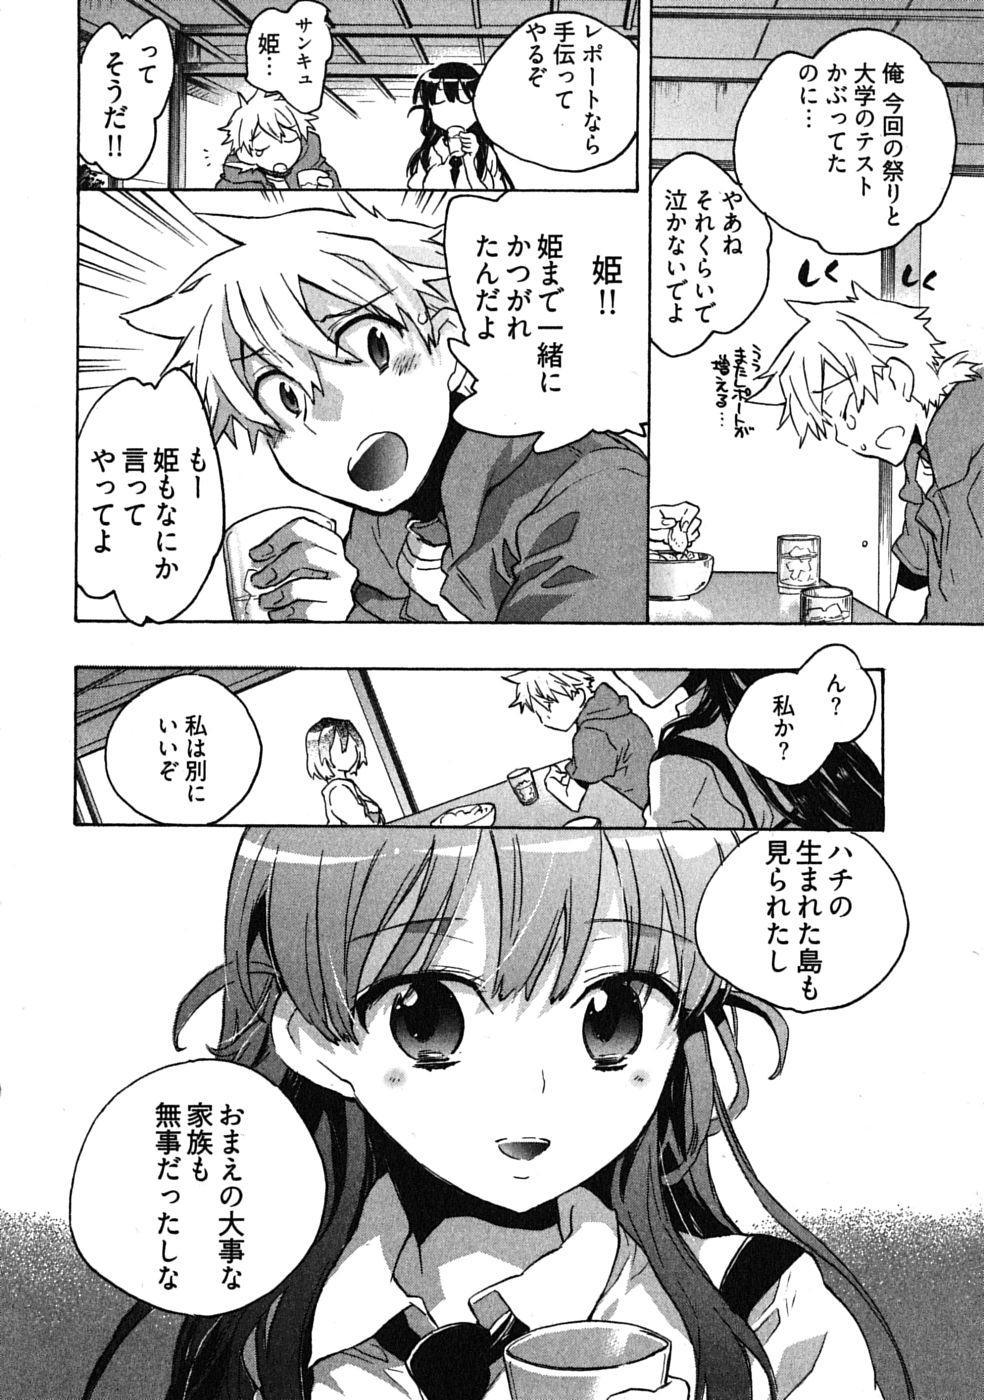 Omocha No Ohime-sama | La Princesse De Jouet Vol. 3 91